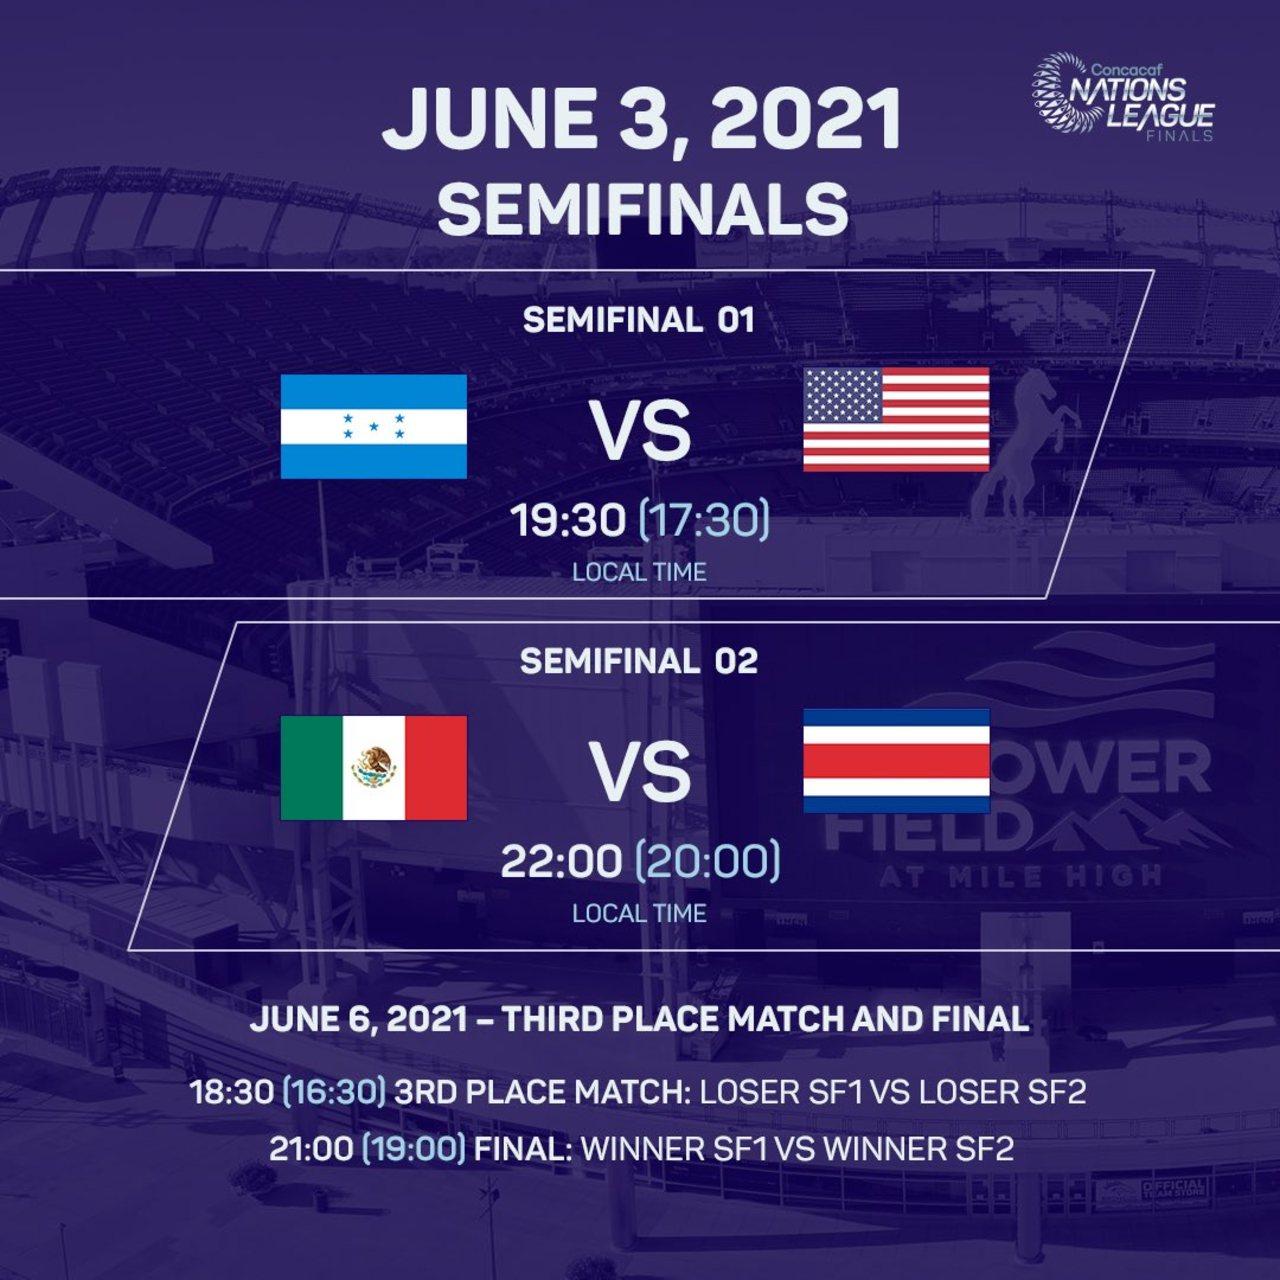 Selección Mexicana convocados partidos mayo junio